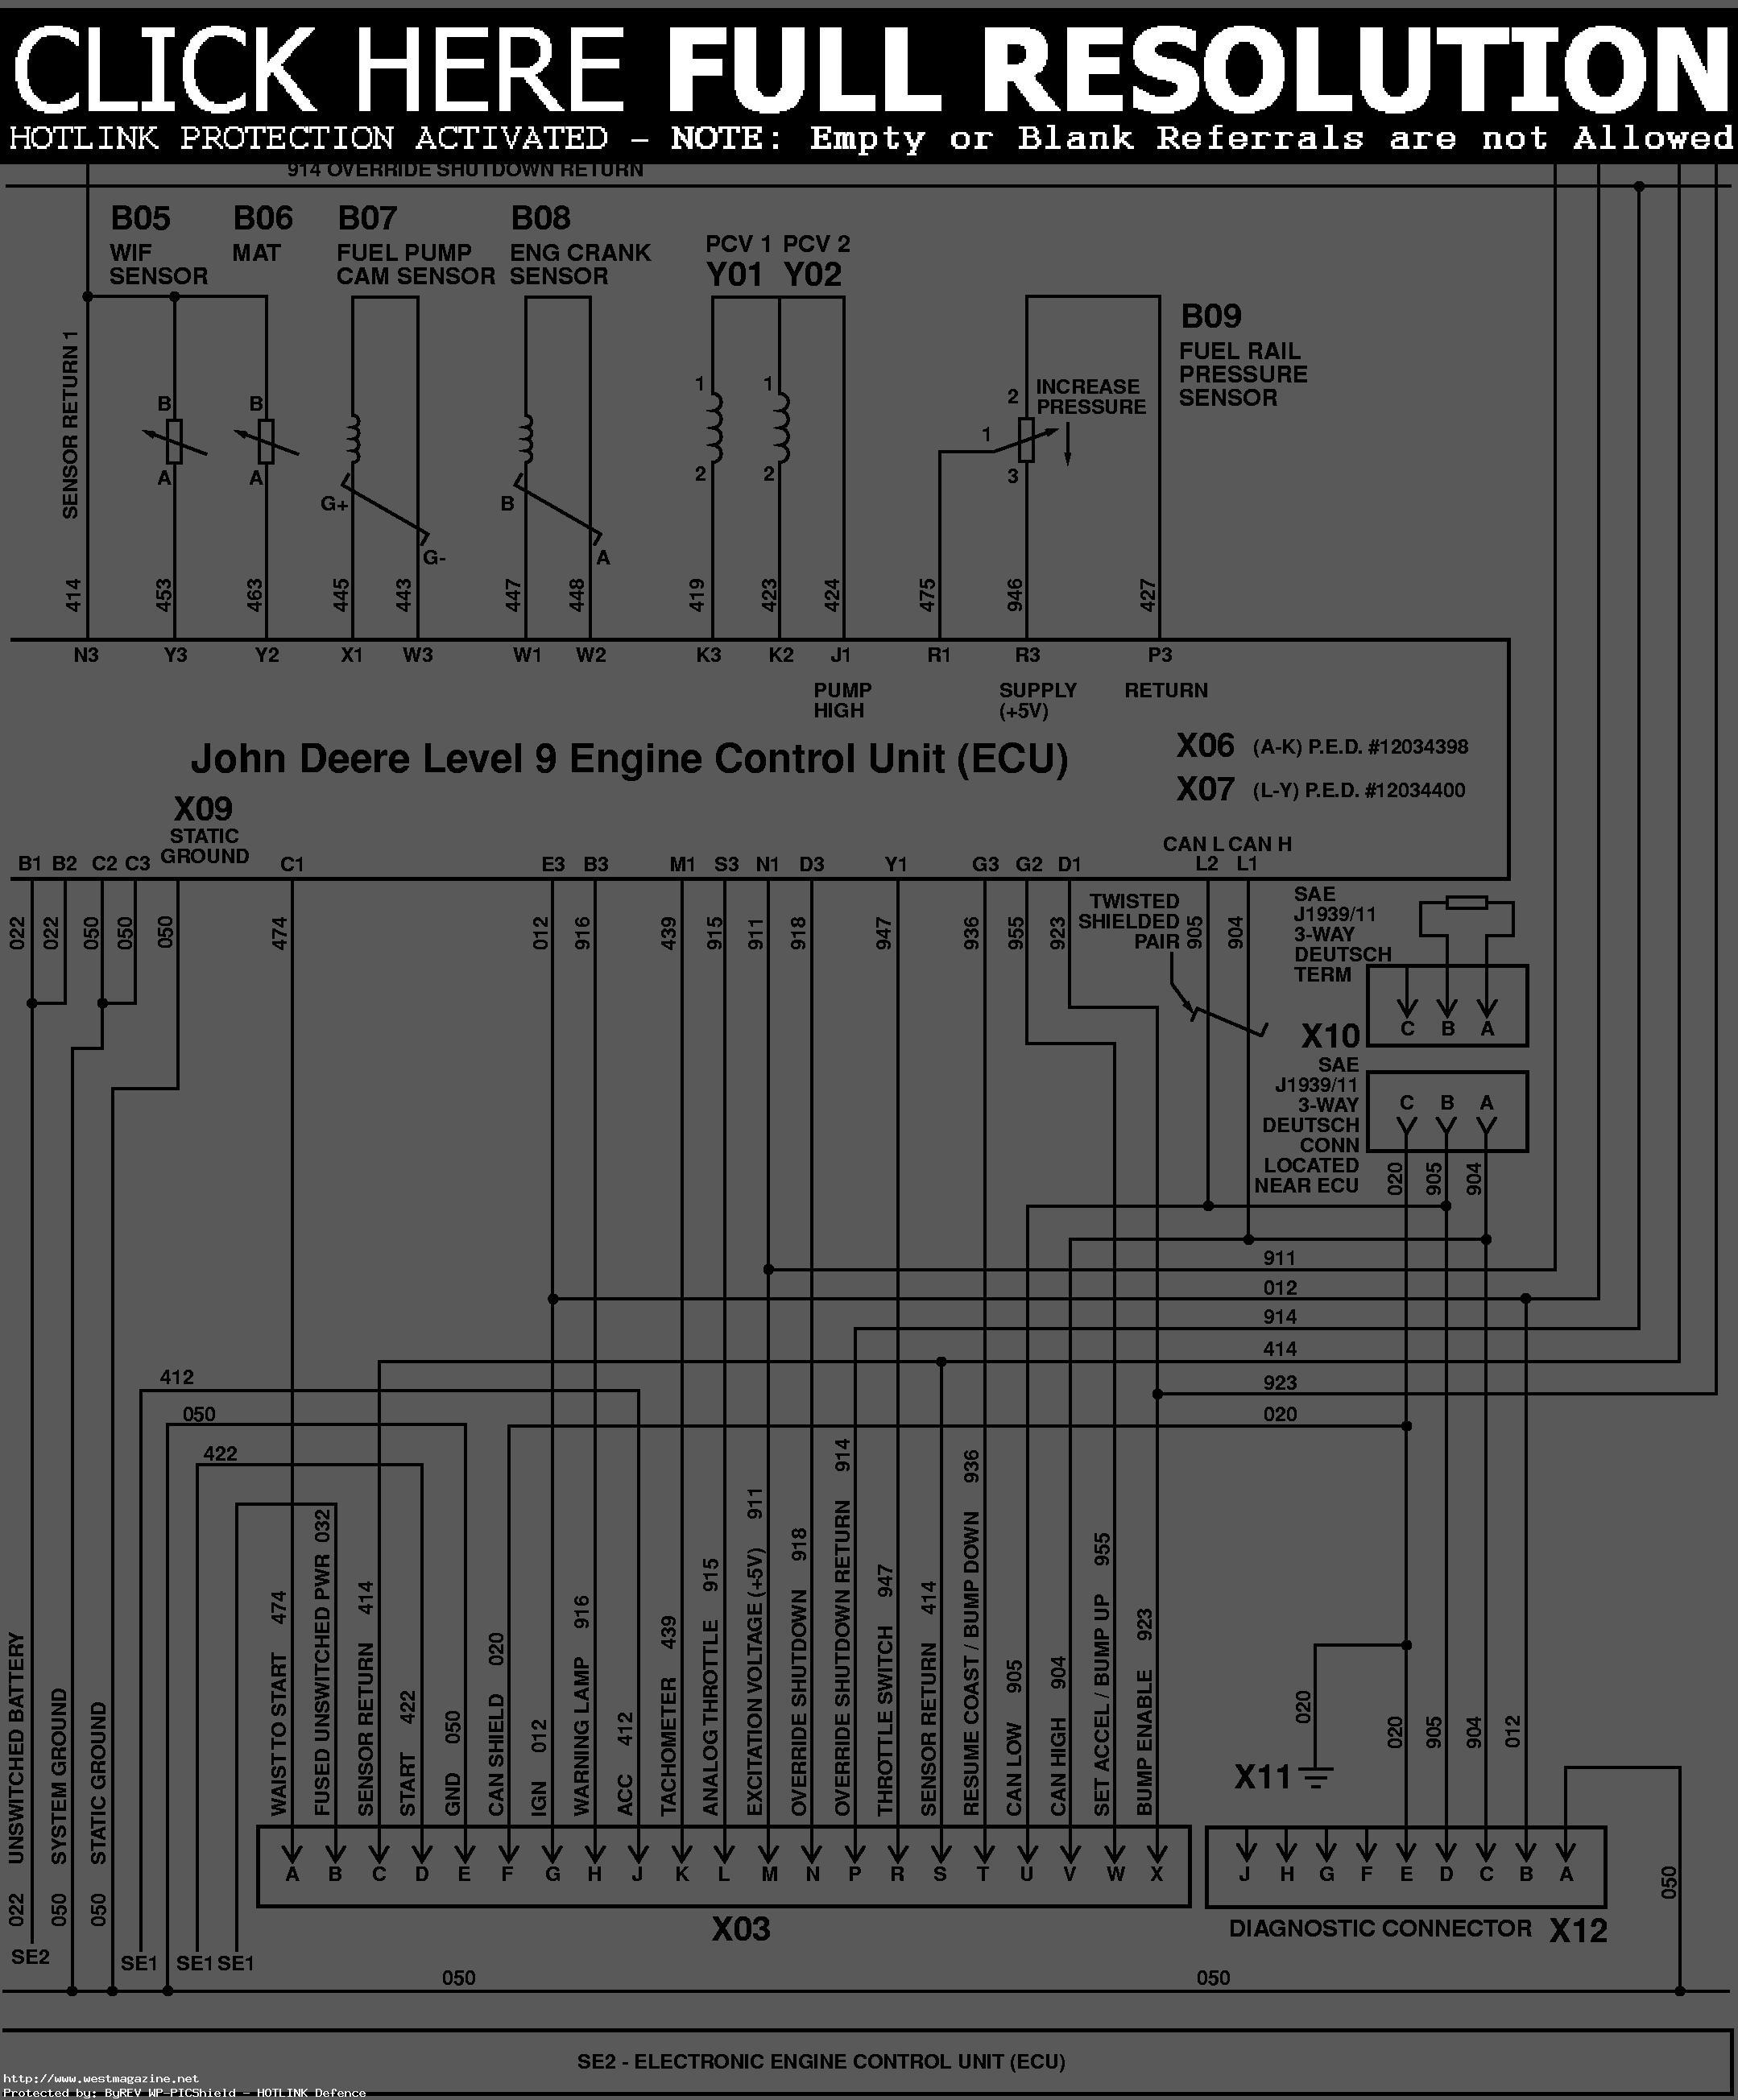 Mnl-2785] John Deere Lt155 Technical Manual | 2019 Ebook Library - John Deere Lt155 Wiring Diagram